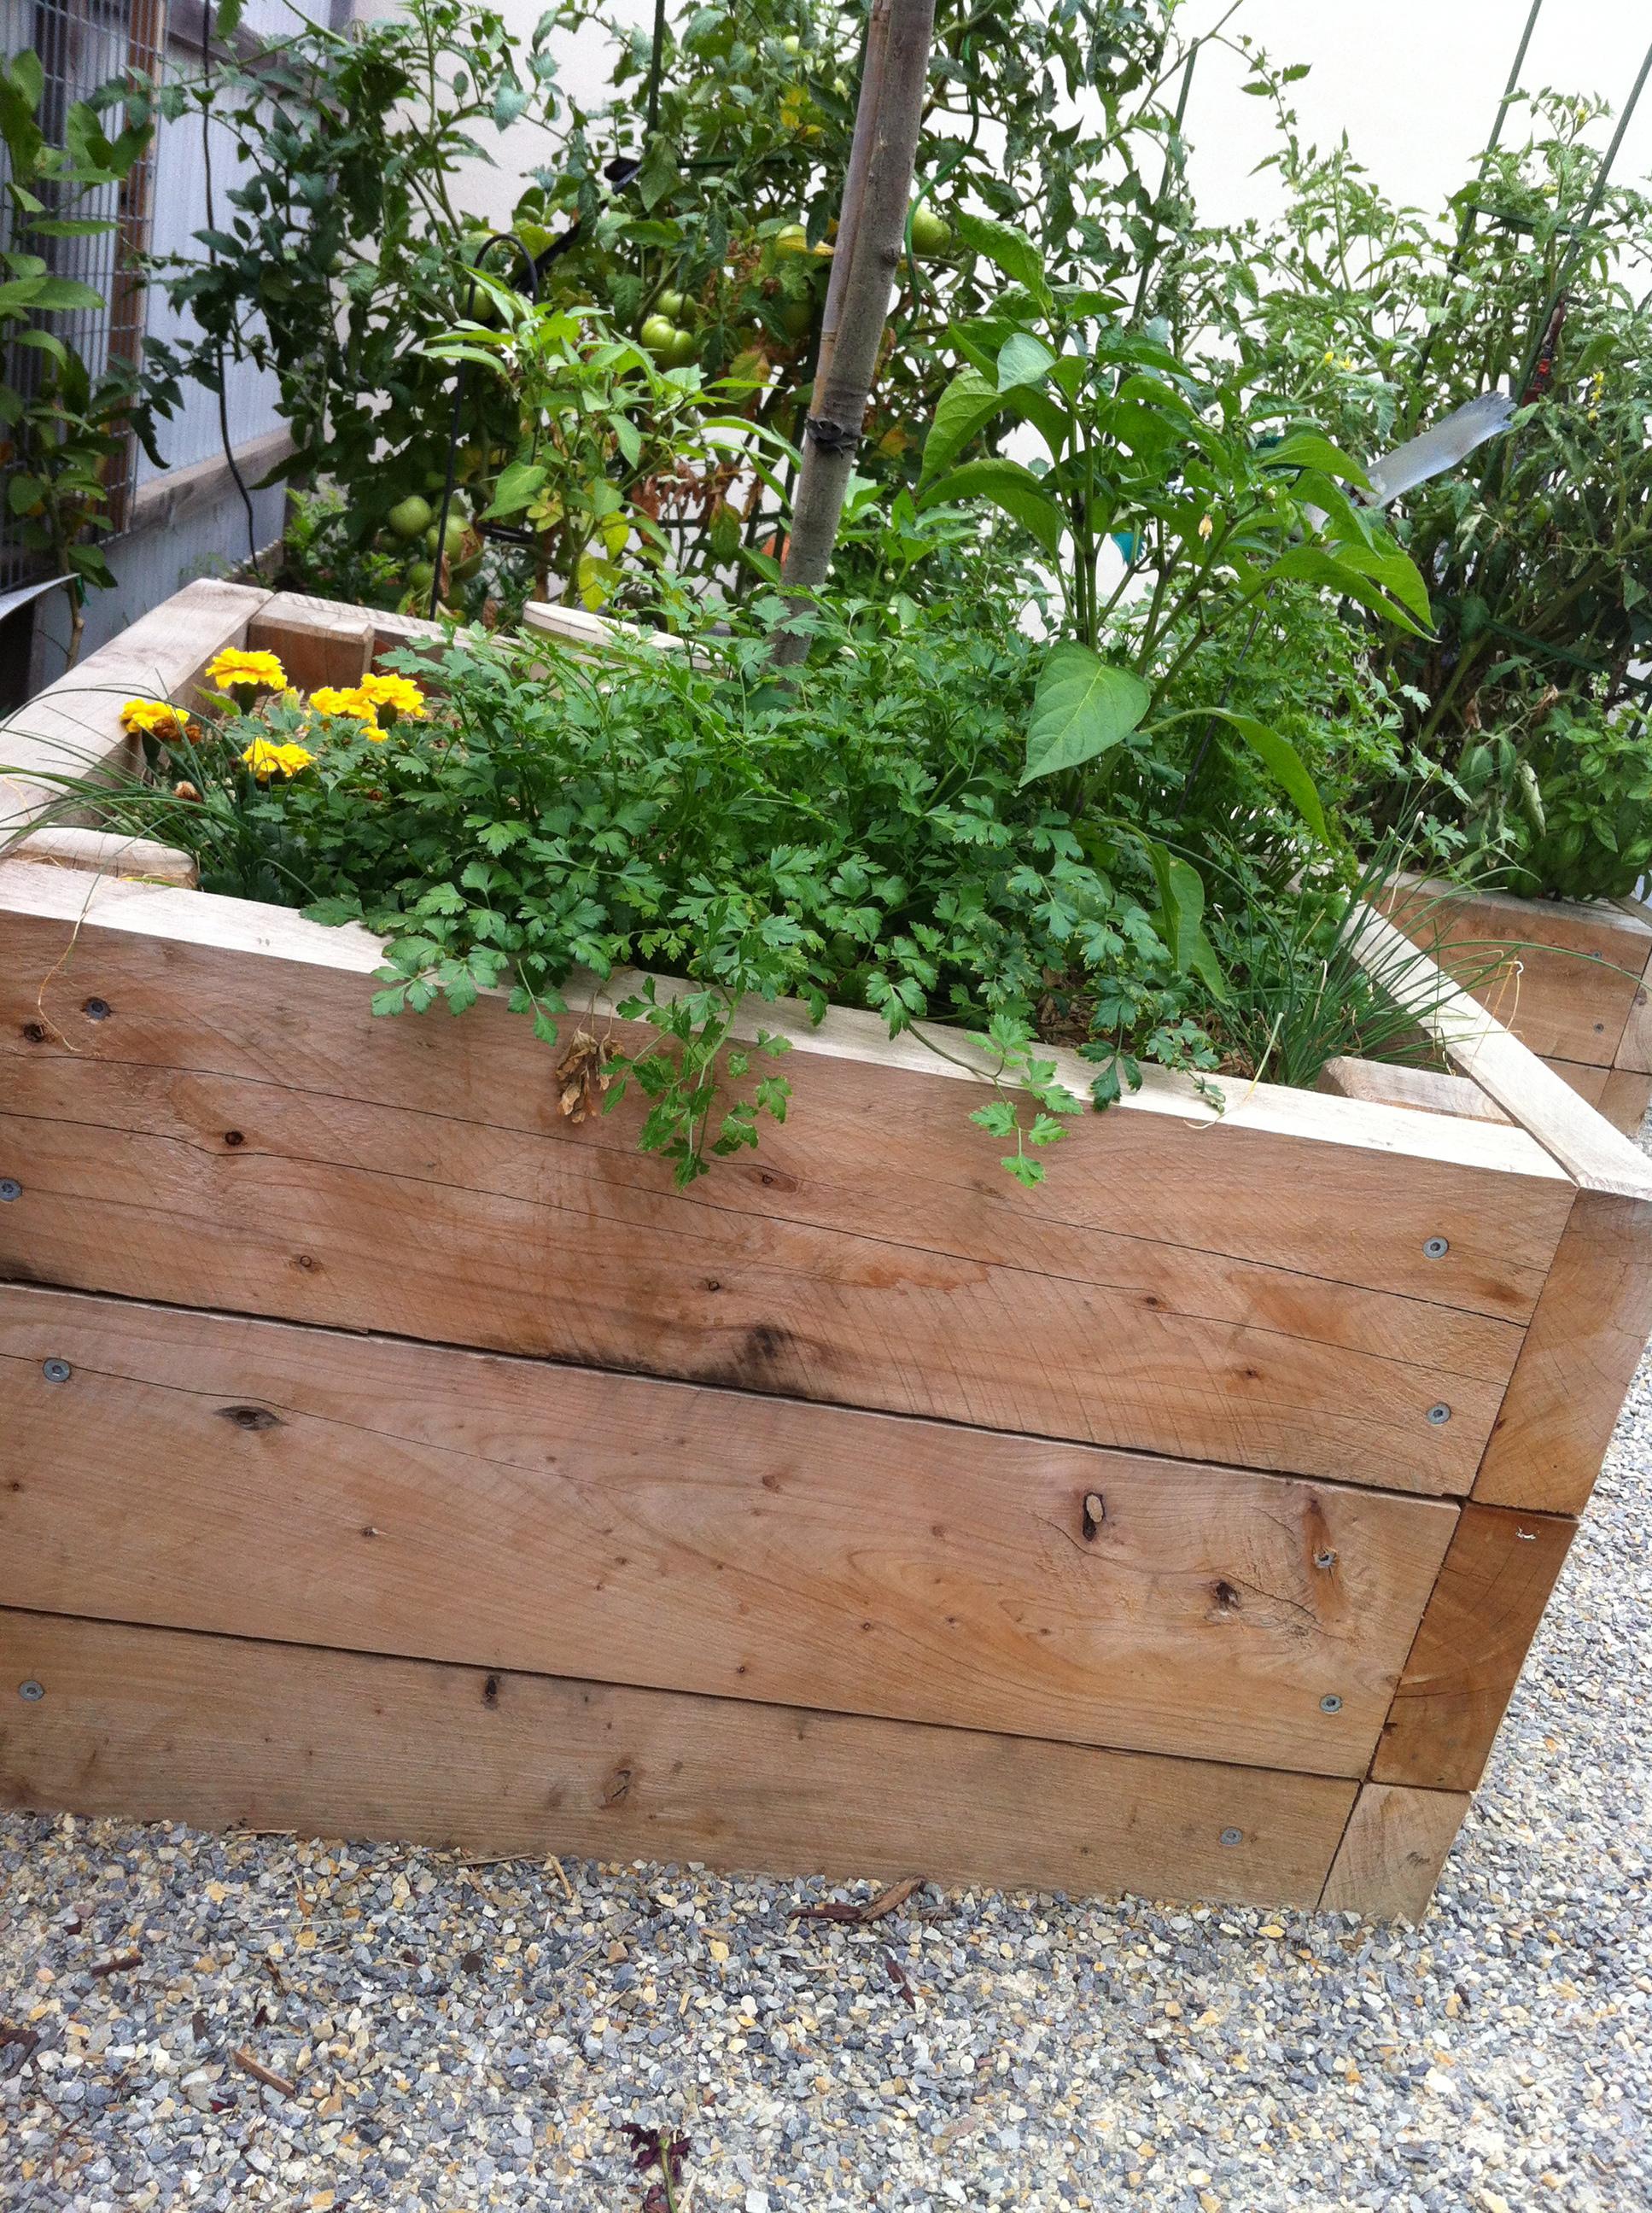 Vegetable gardens in small spaces - Small Spaces Garden Design